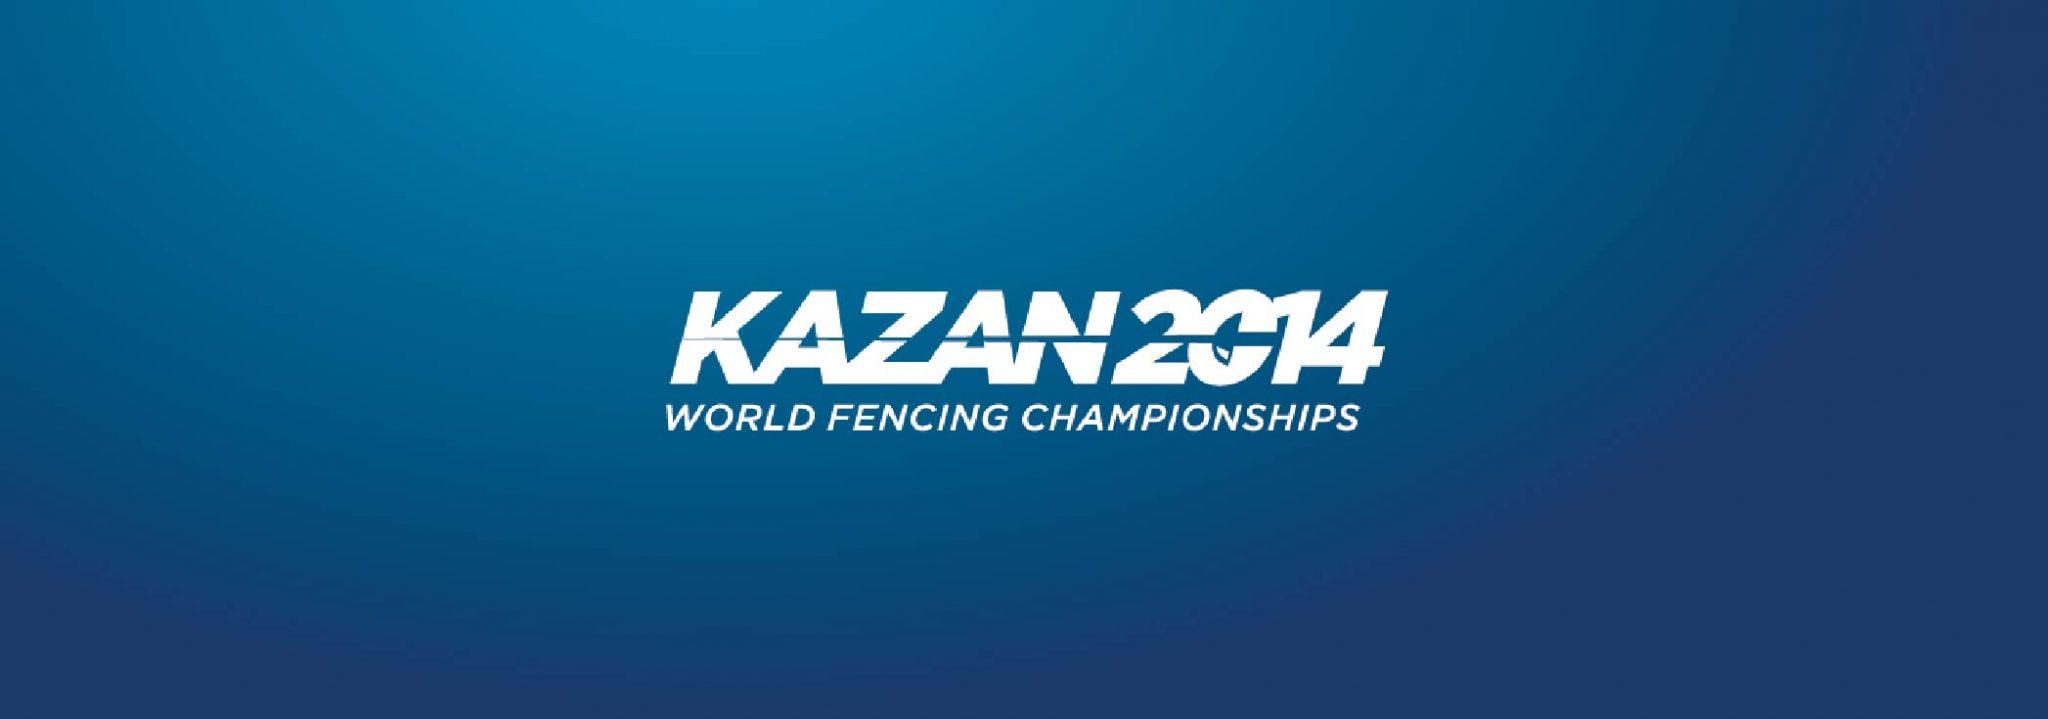 2014 World Fencing Championships